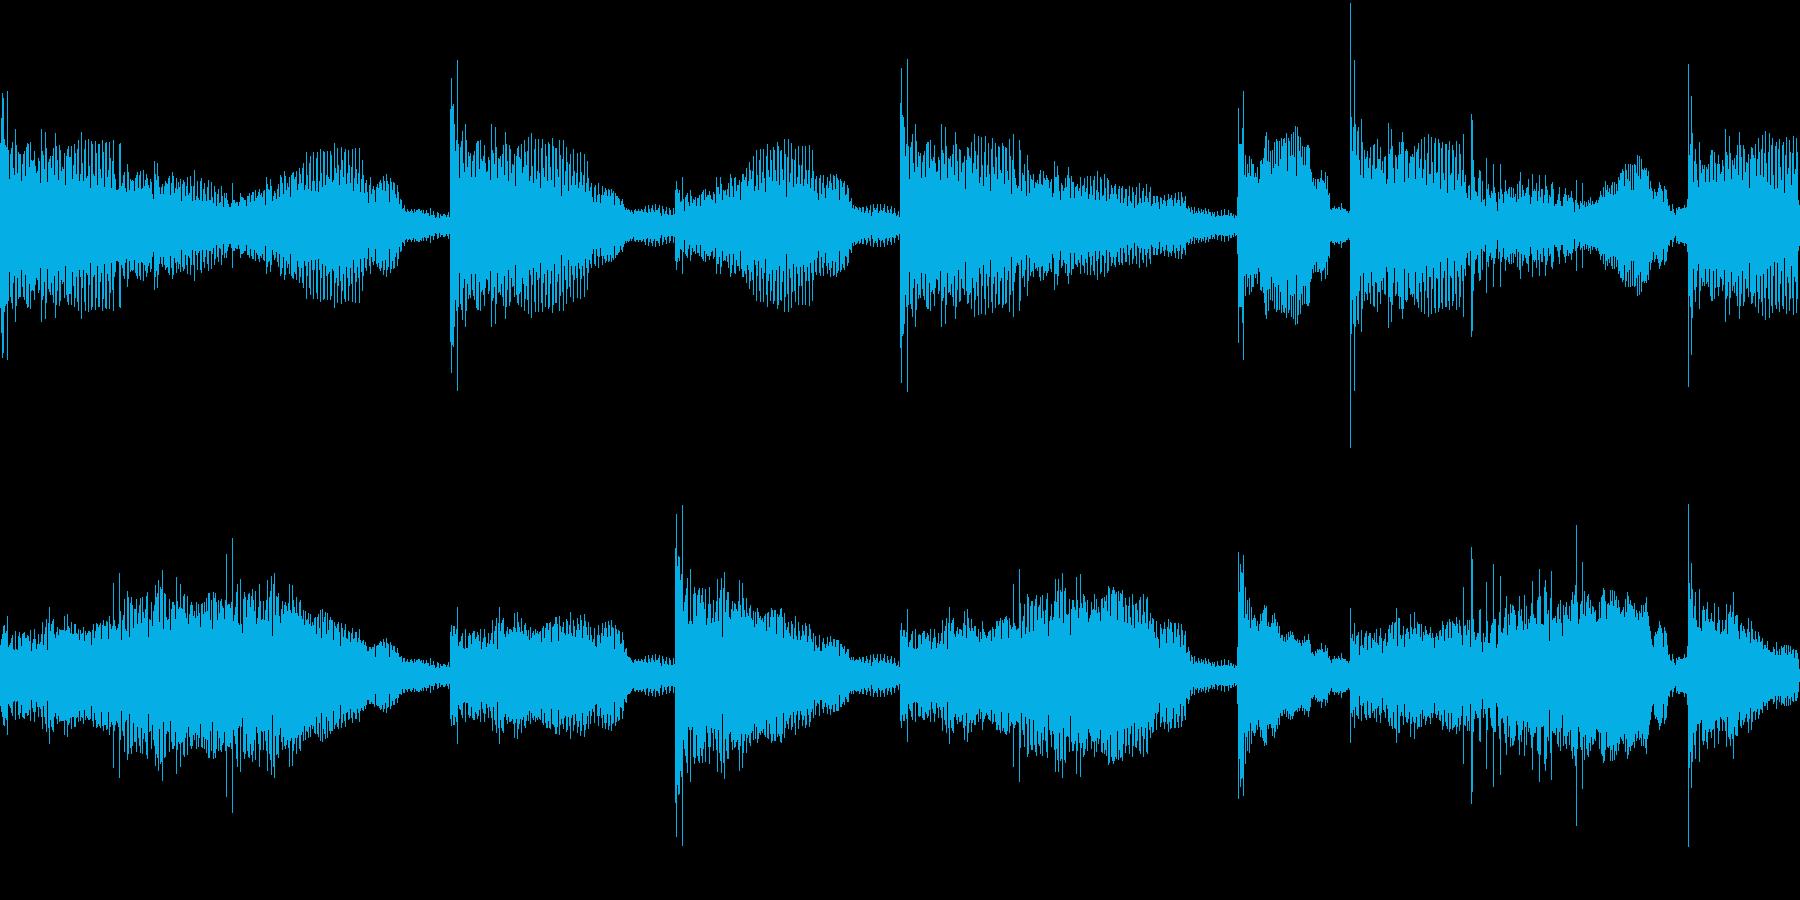 Hiphop デジタル RAP VOXの再生済みの波形